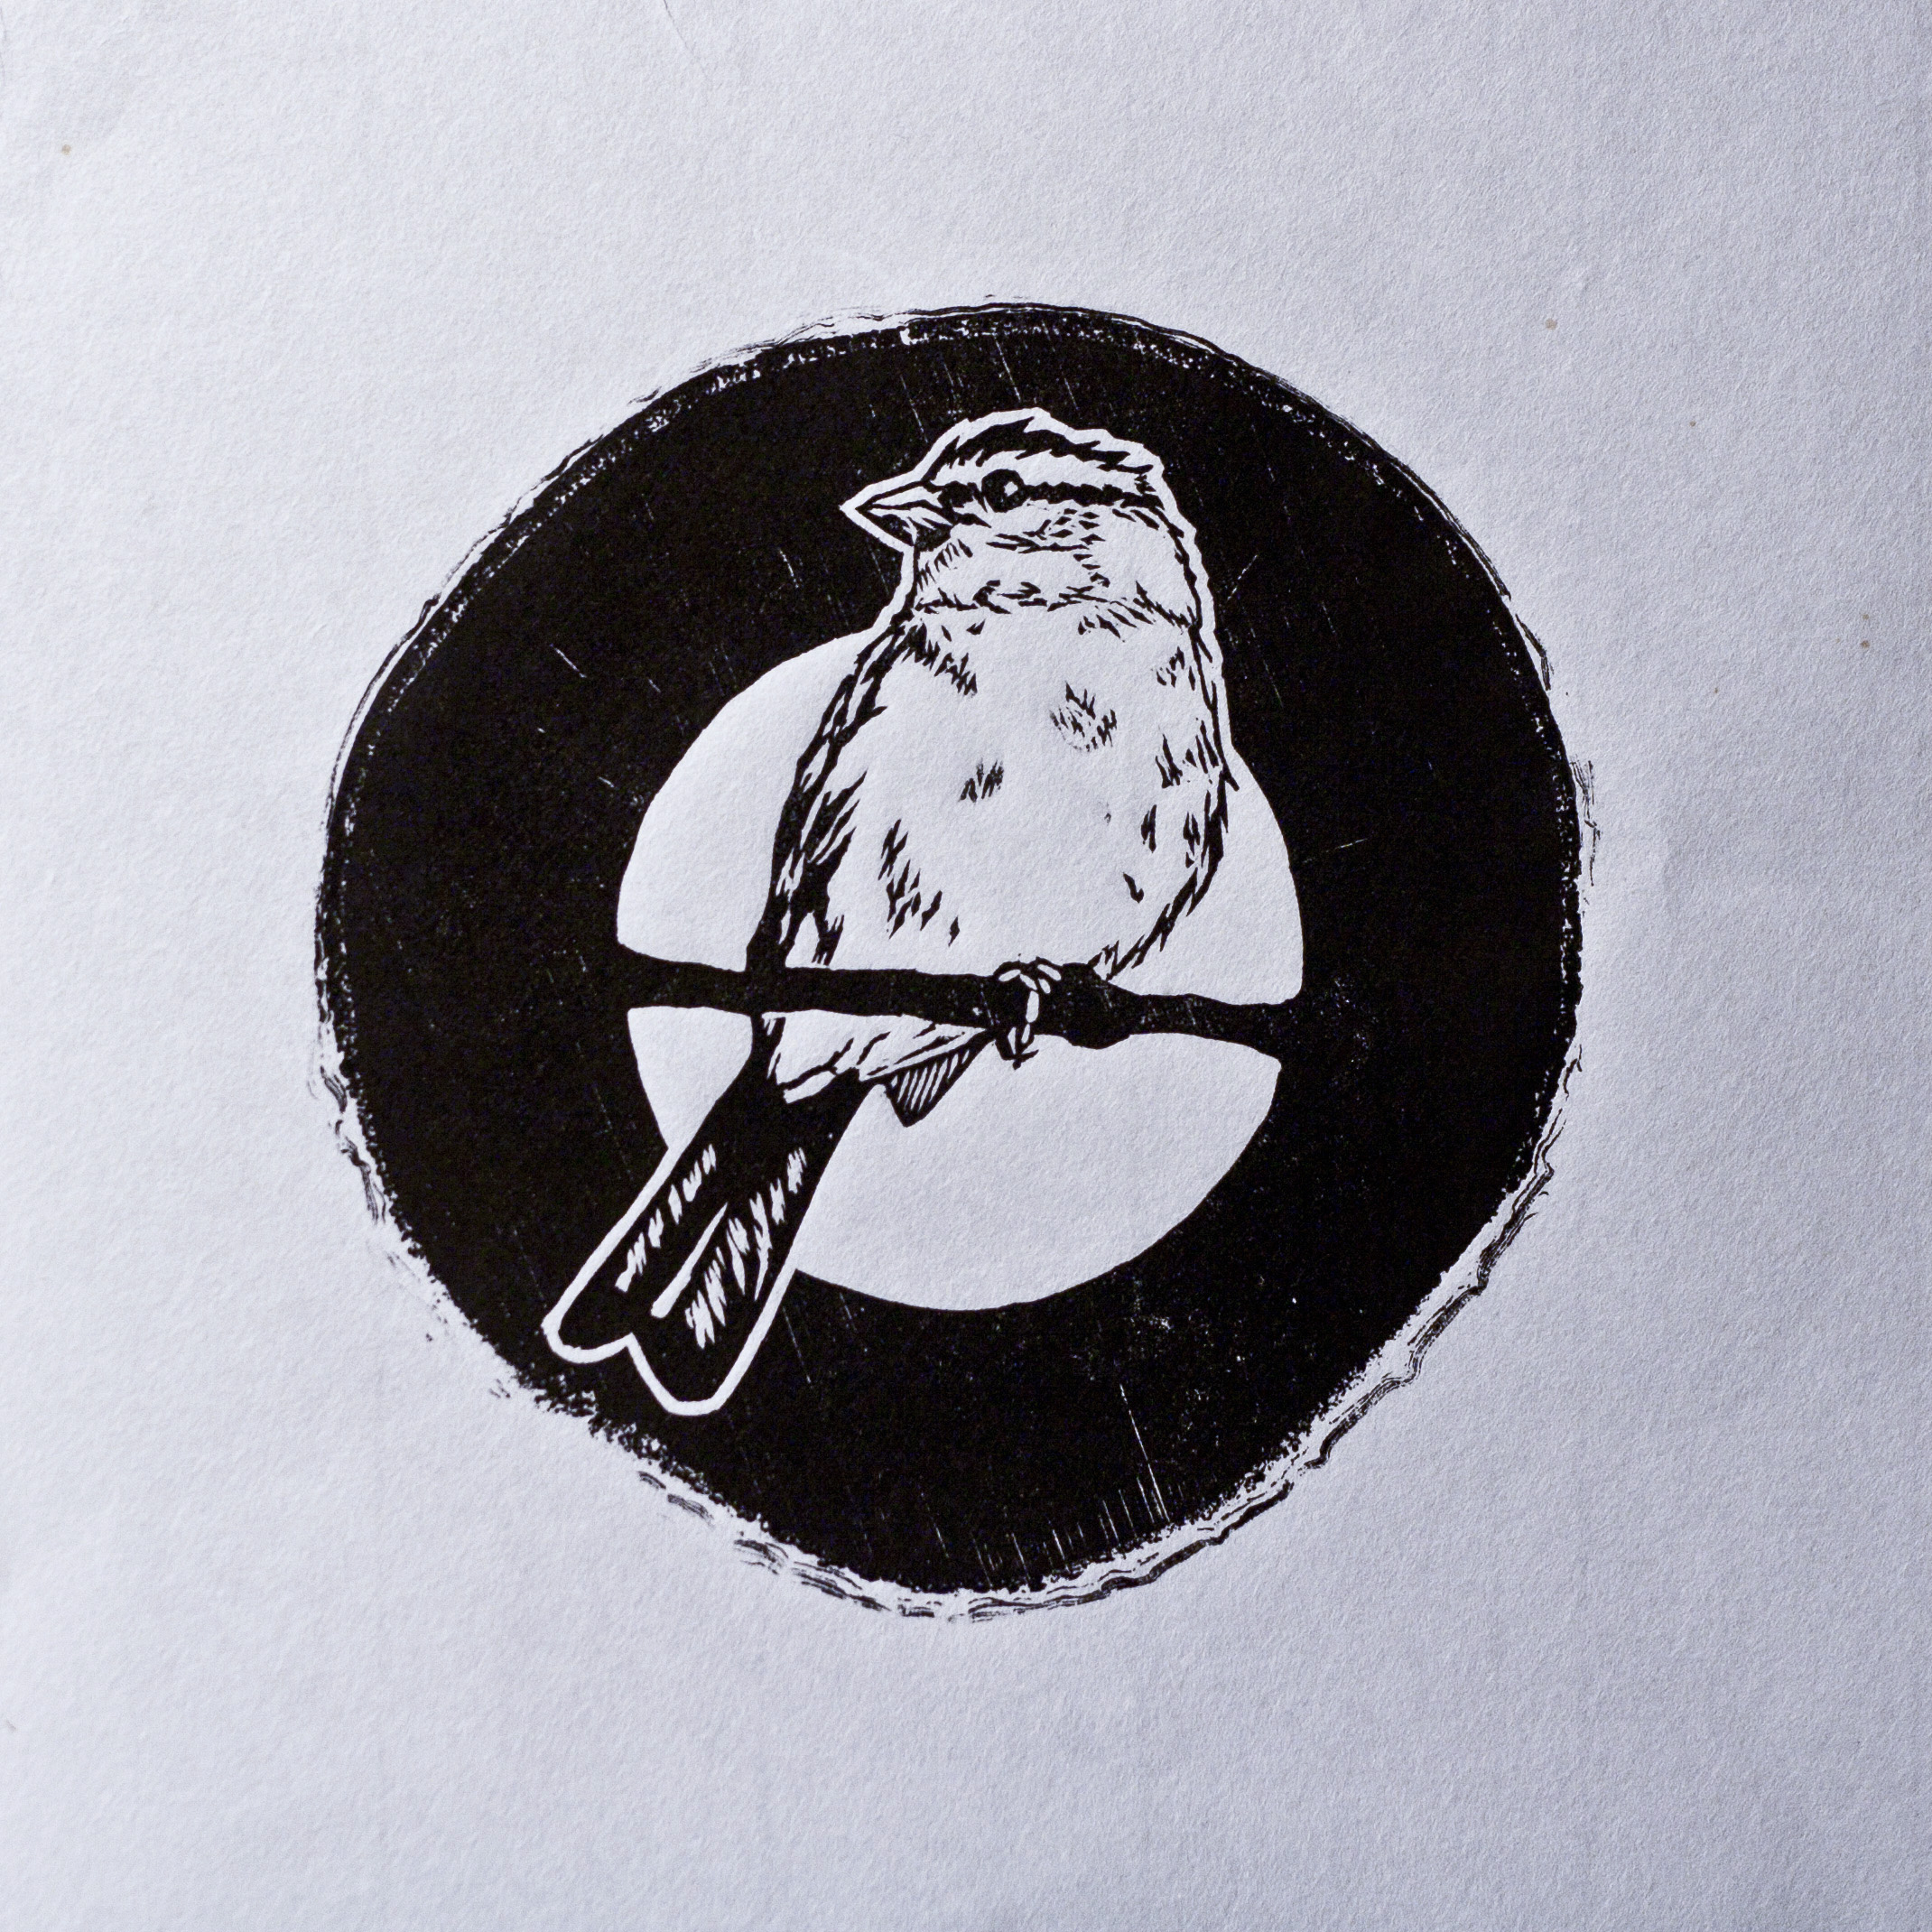 Sparrow_WoodcutPrint_StanleyLeonard